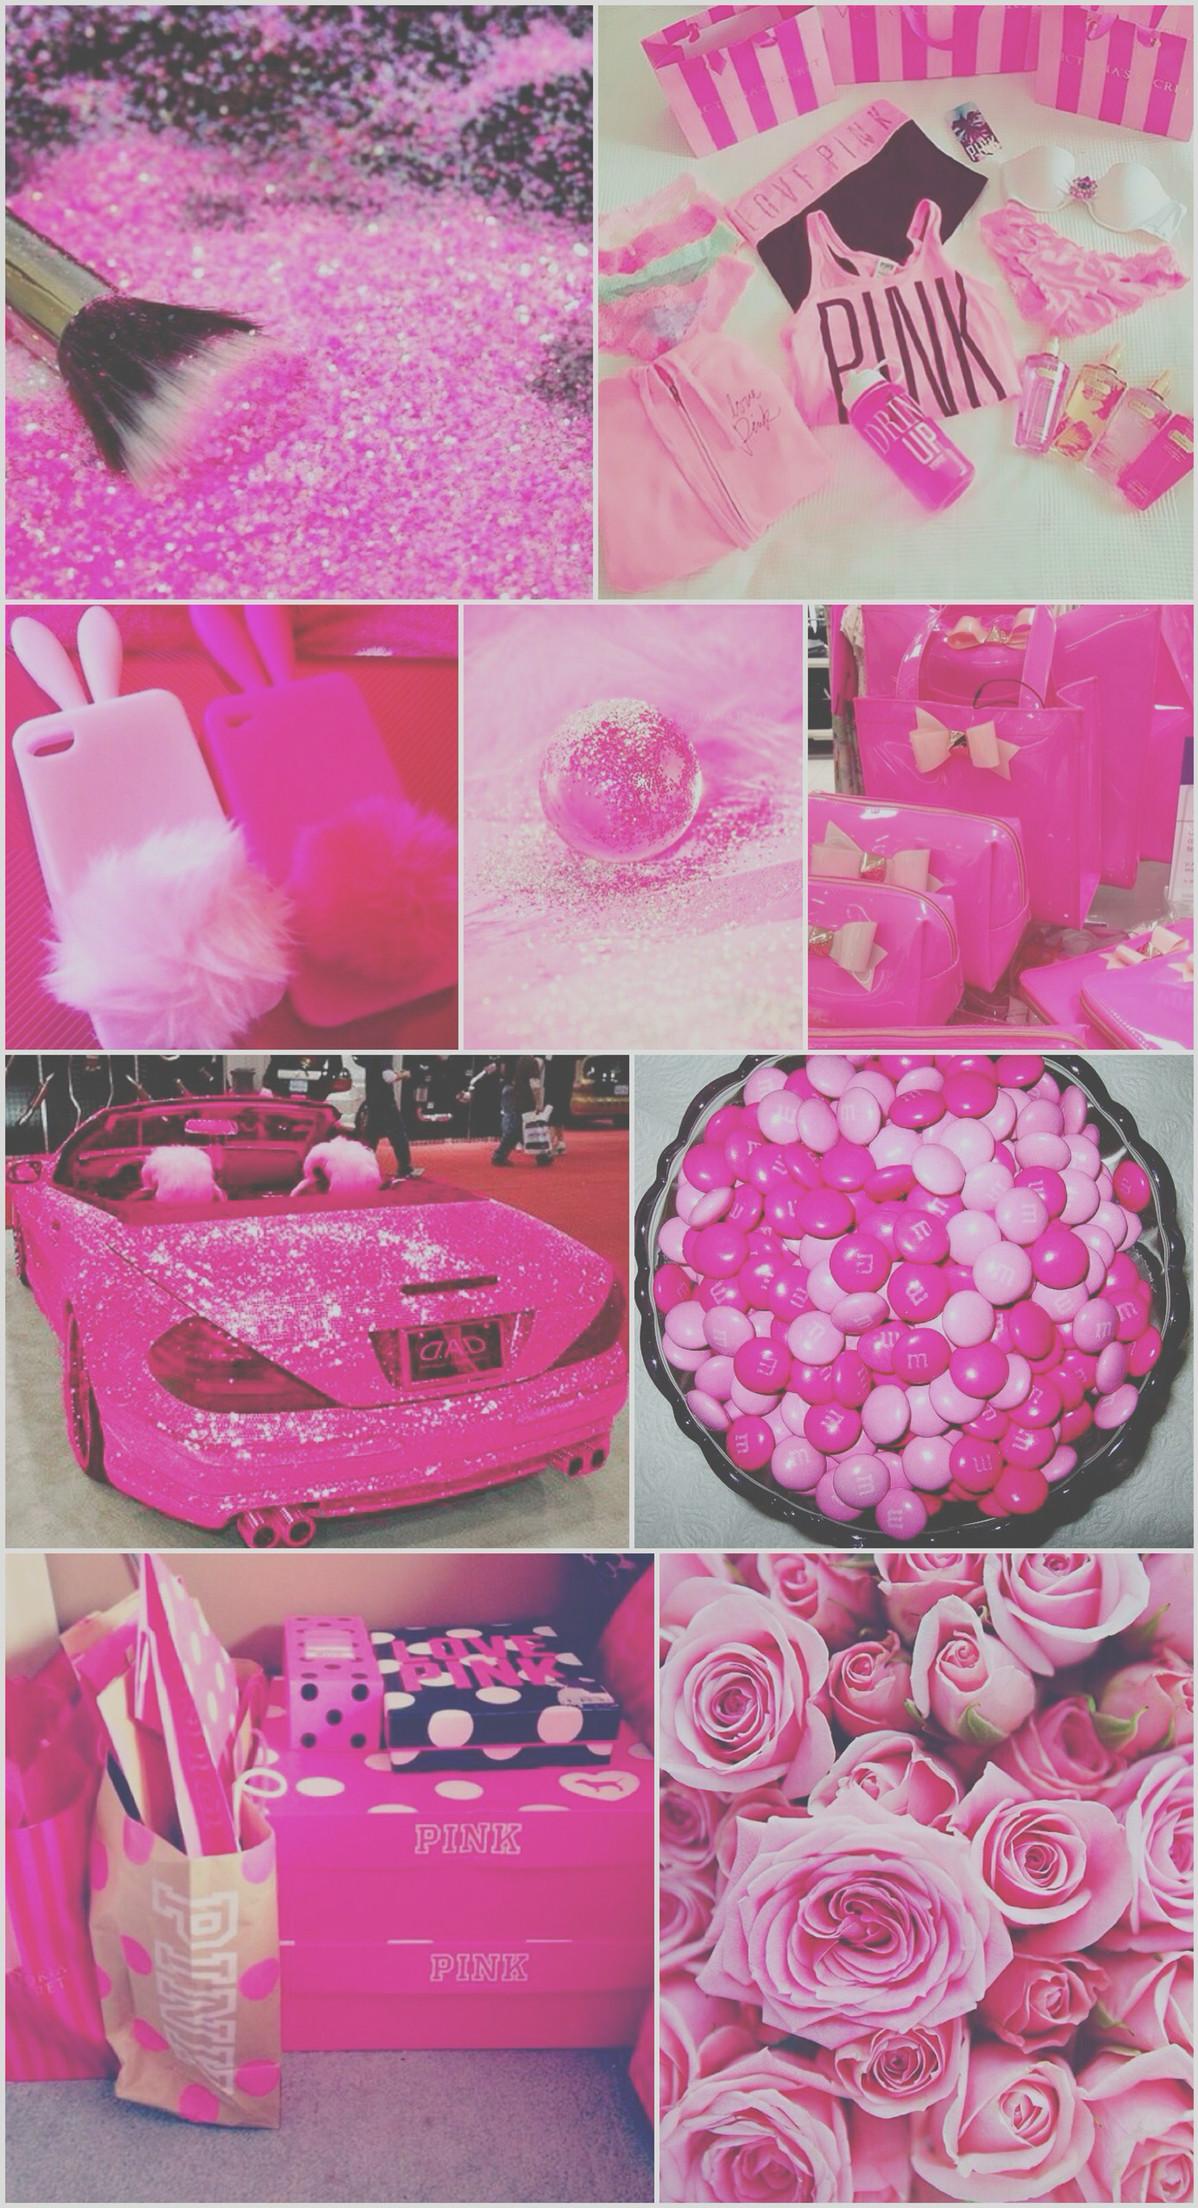 Pink Stuff Wallpaper, background, iPhone, cute, pretty, glitter, food